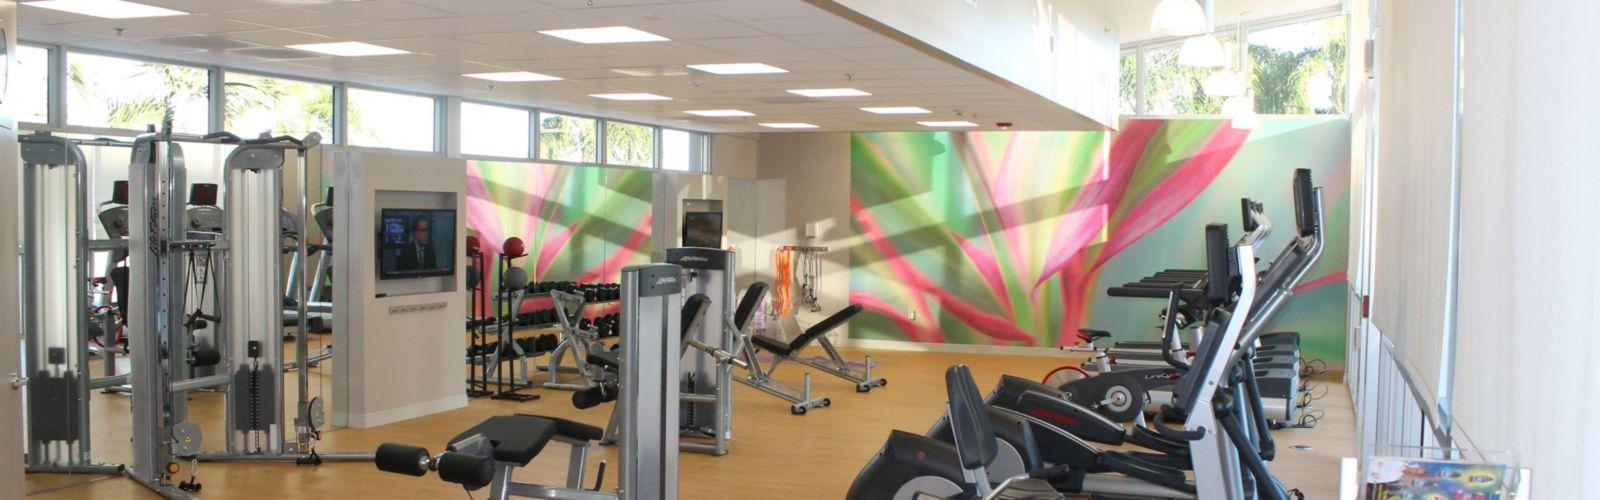 Gym Photo